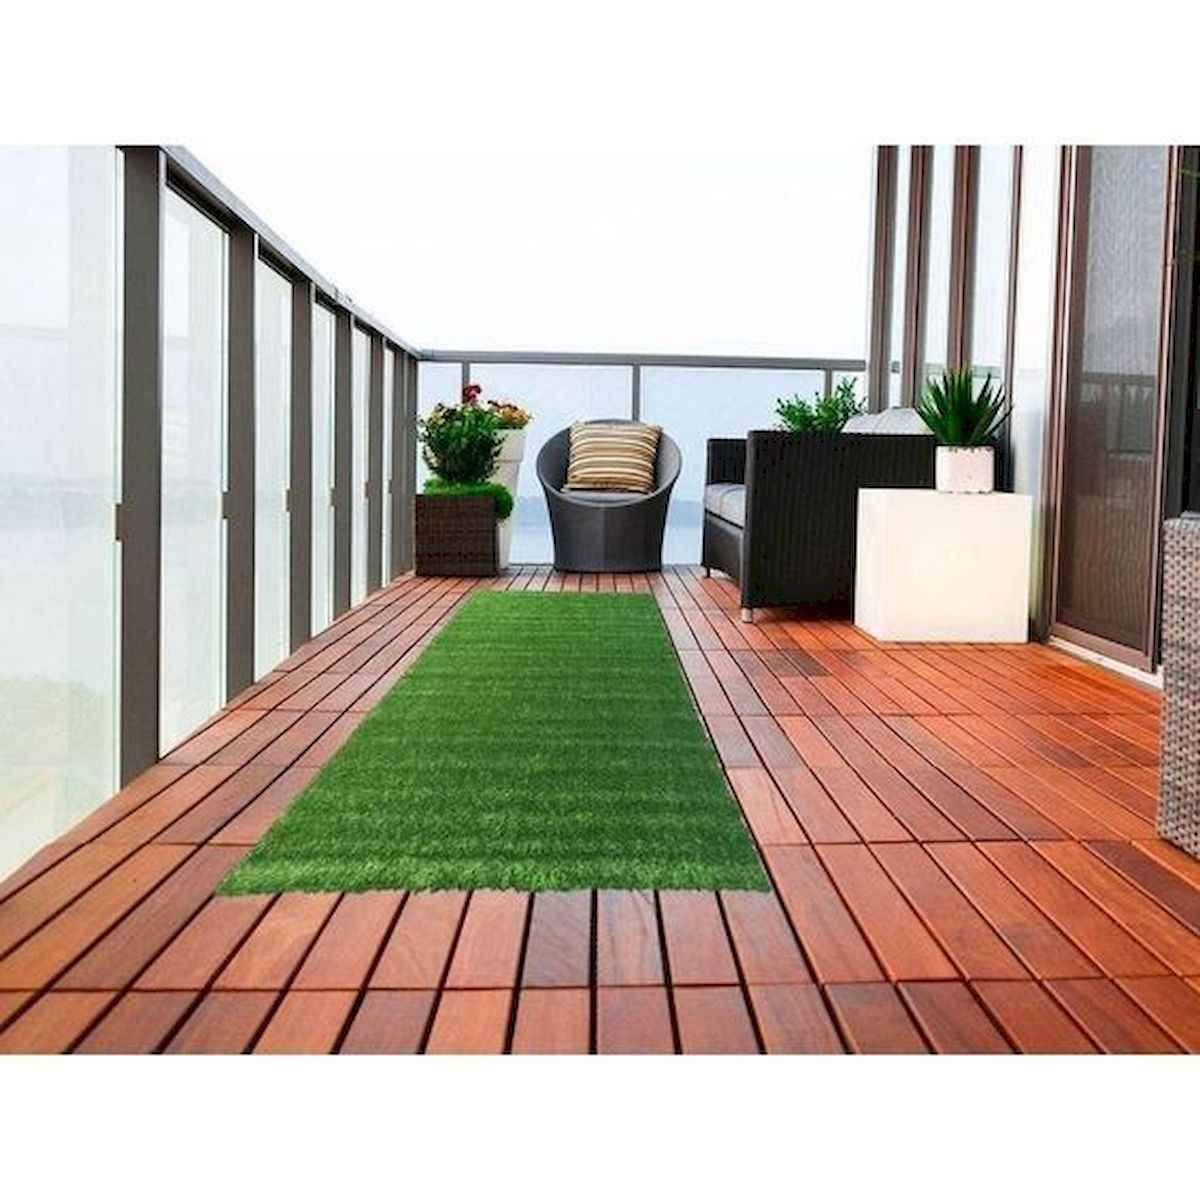 35 Inspiring Small Garden Design Ideas On A Budget (31)